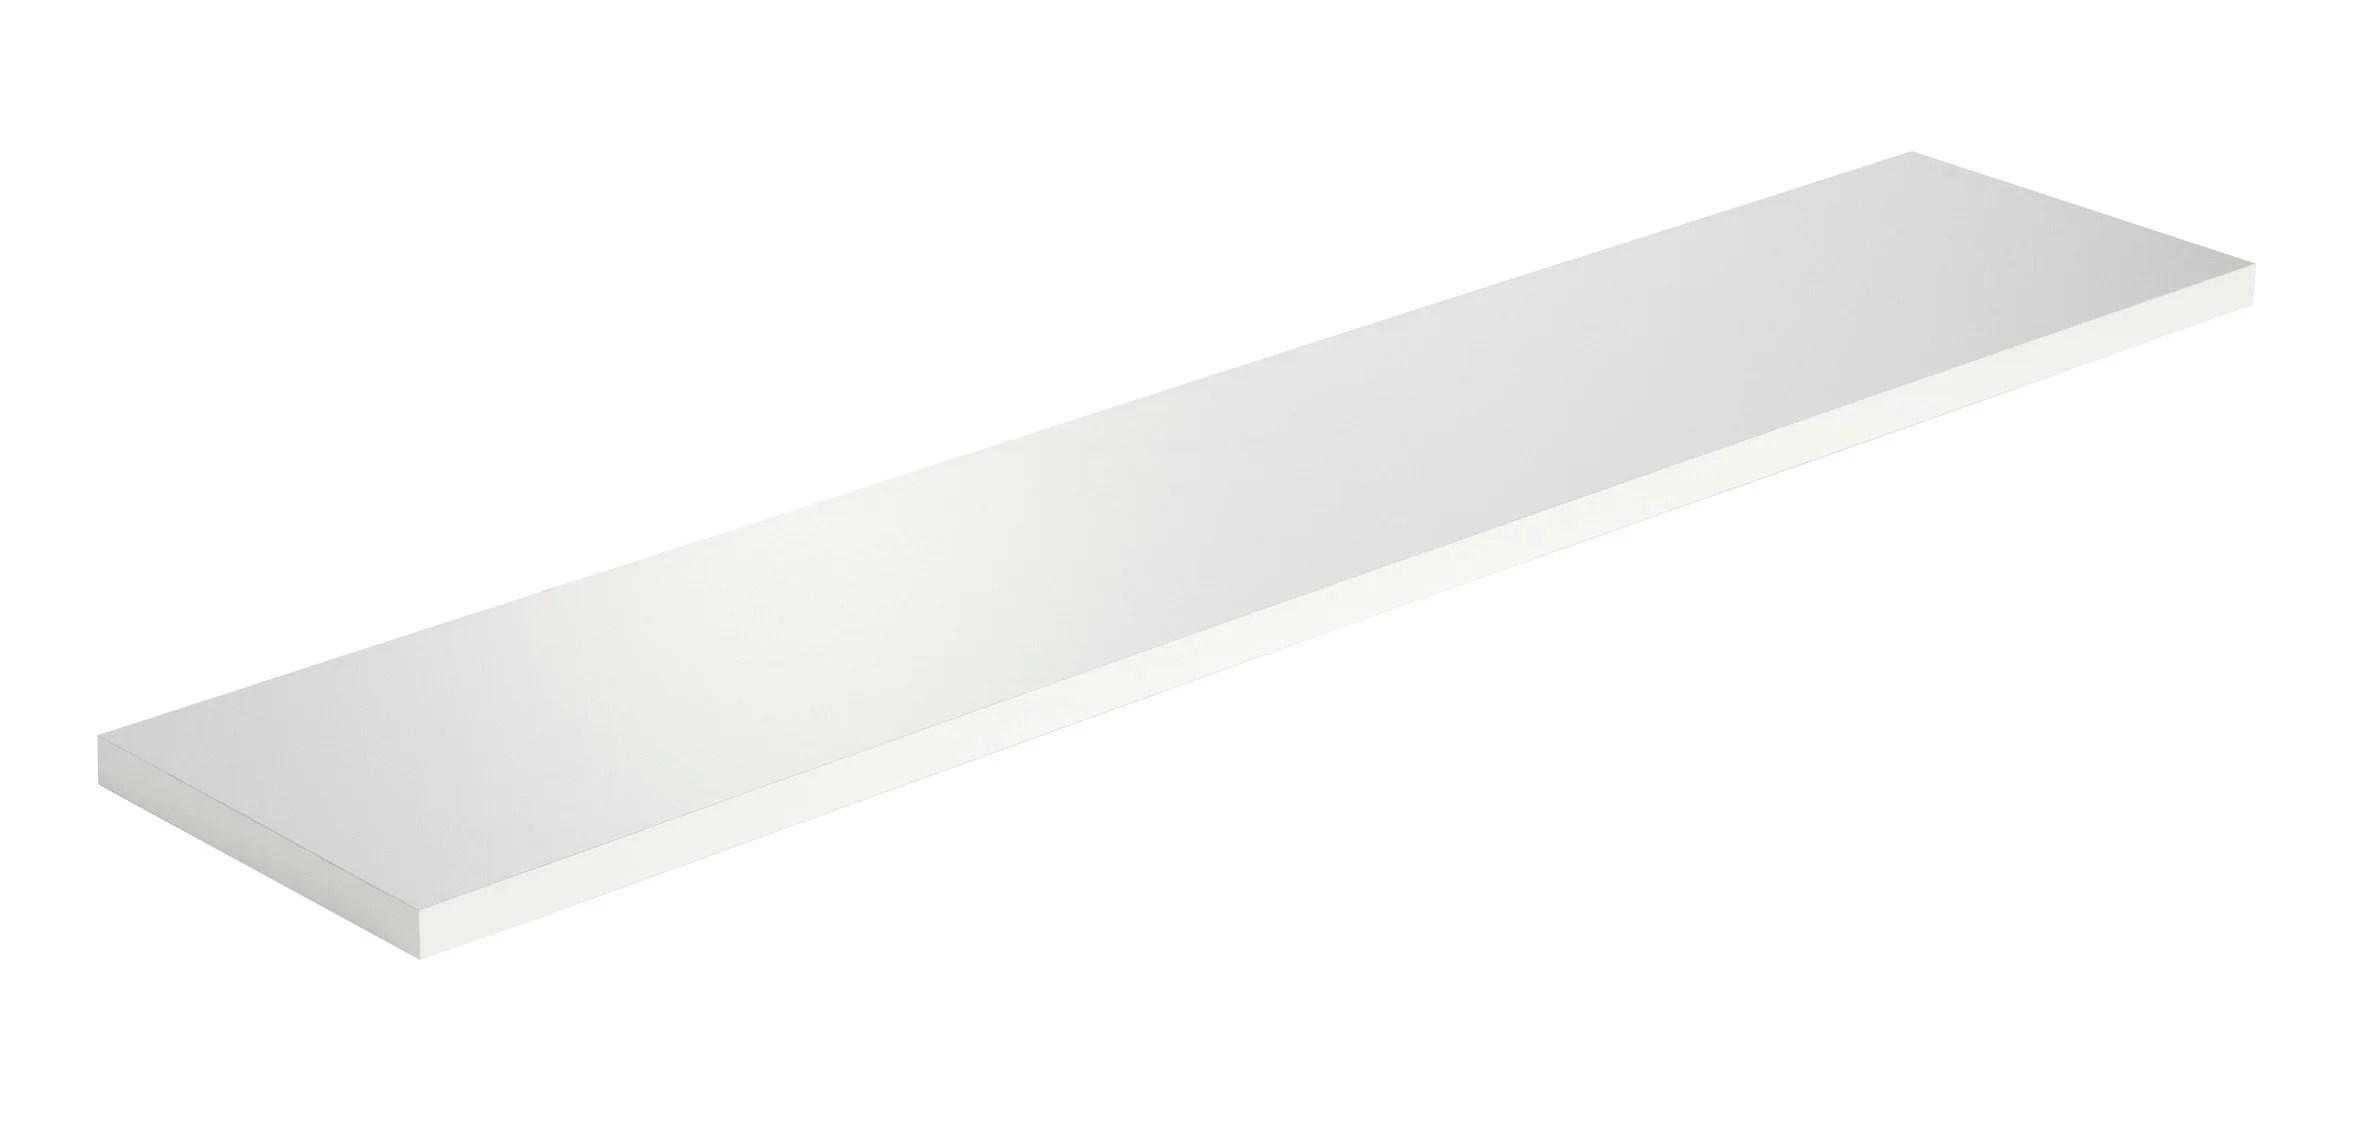 Etagere Murale Blanc L 80 X P 18 Cm Ep 18 Mm Leroy Merlin